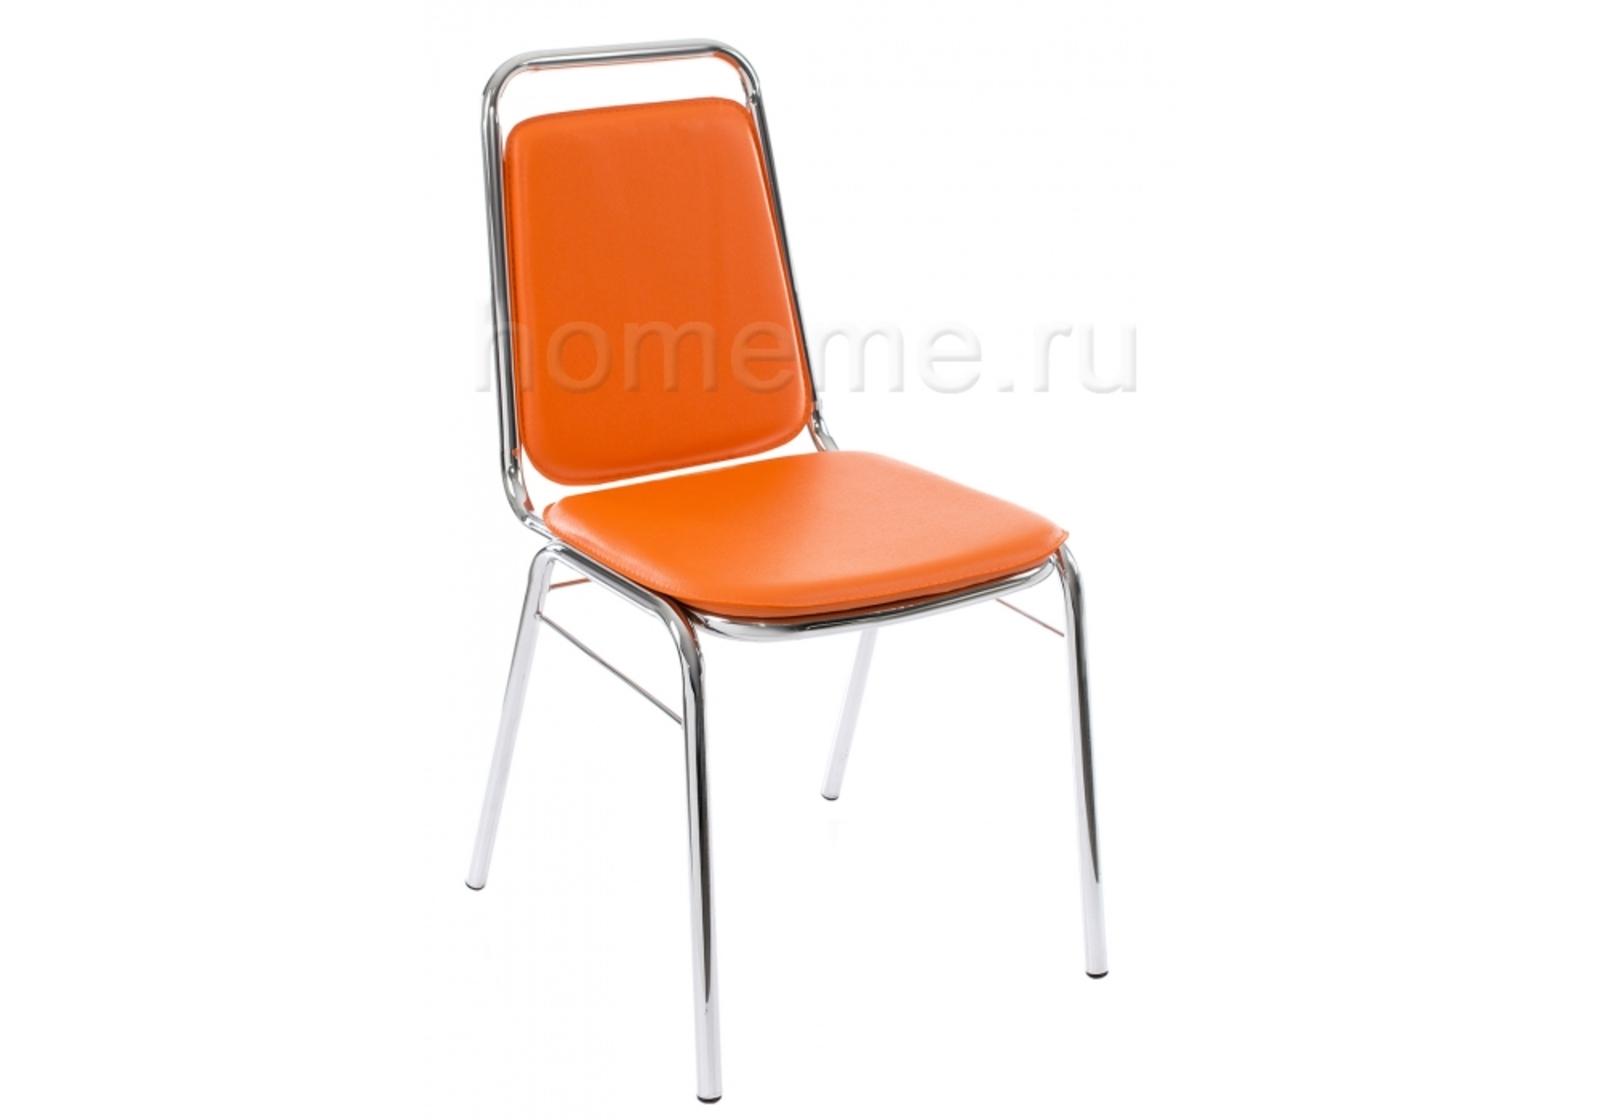 Стул HomeMe Стул Riol оранжевый 11047 от Homeme.ru